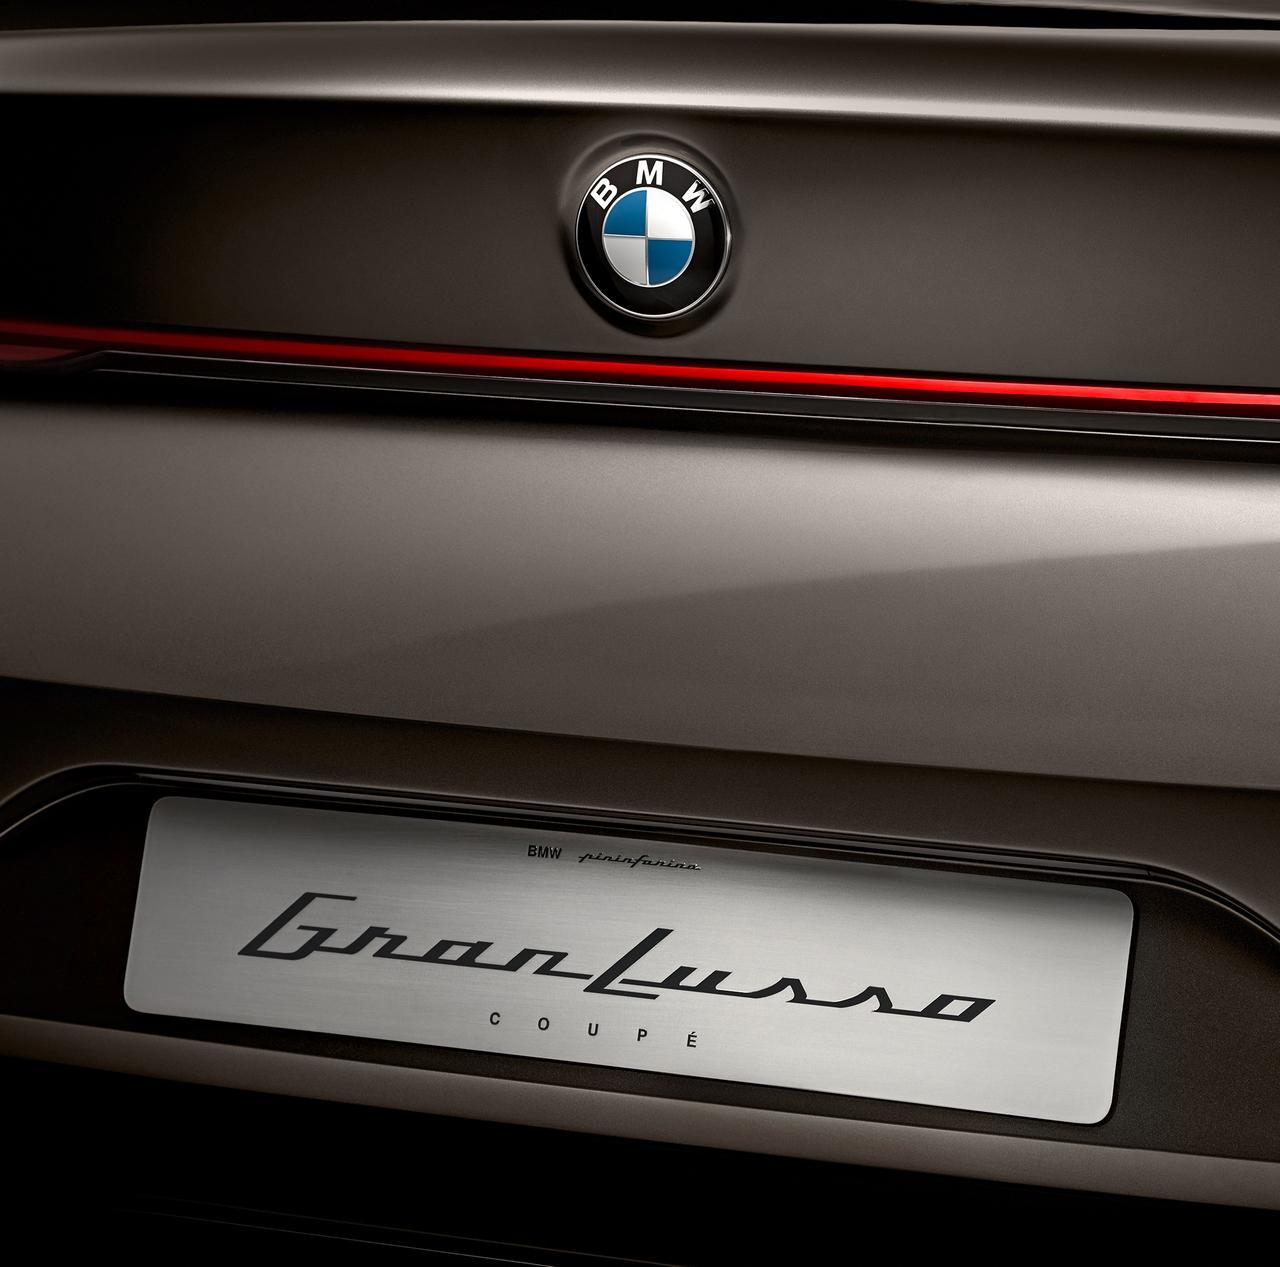 bmw-pininfarina-gran-lusso-coupe_0-100_4